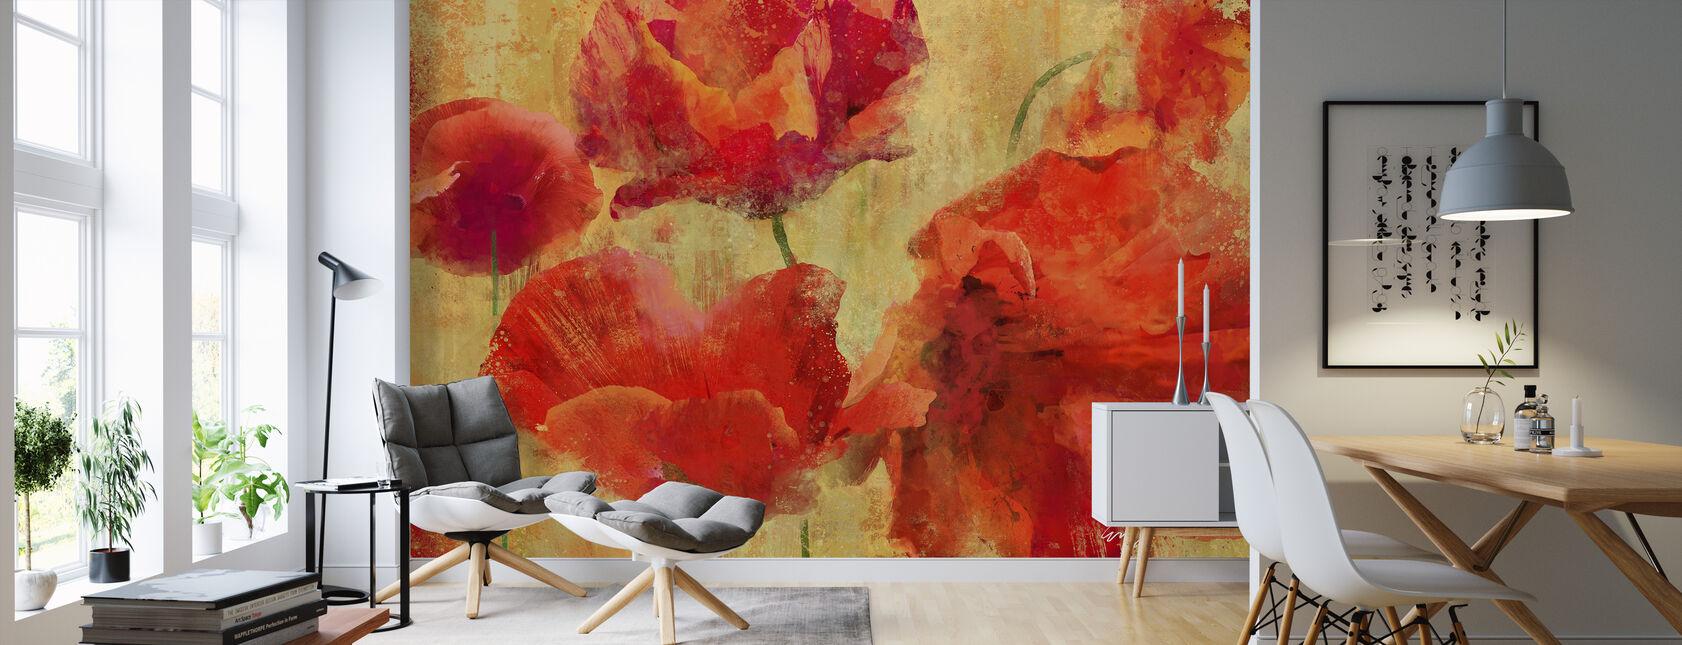 Expressive Flowers - Wallpaper - Living Room